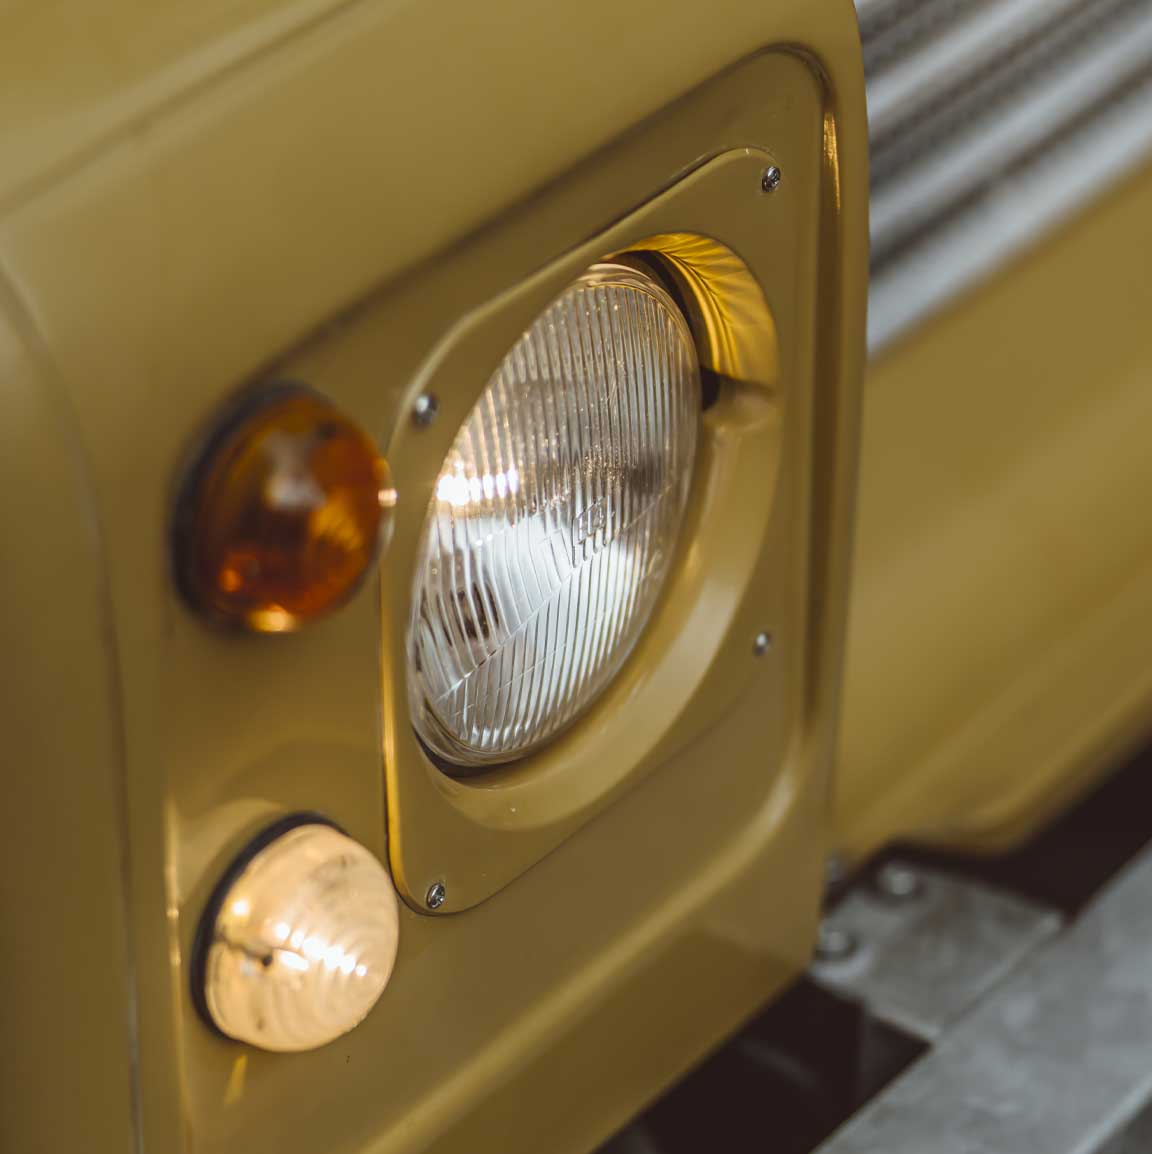 1975_Land_Rover_Series_III_109_Bahama_Gold_Small_0012_Layer 58.jpg